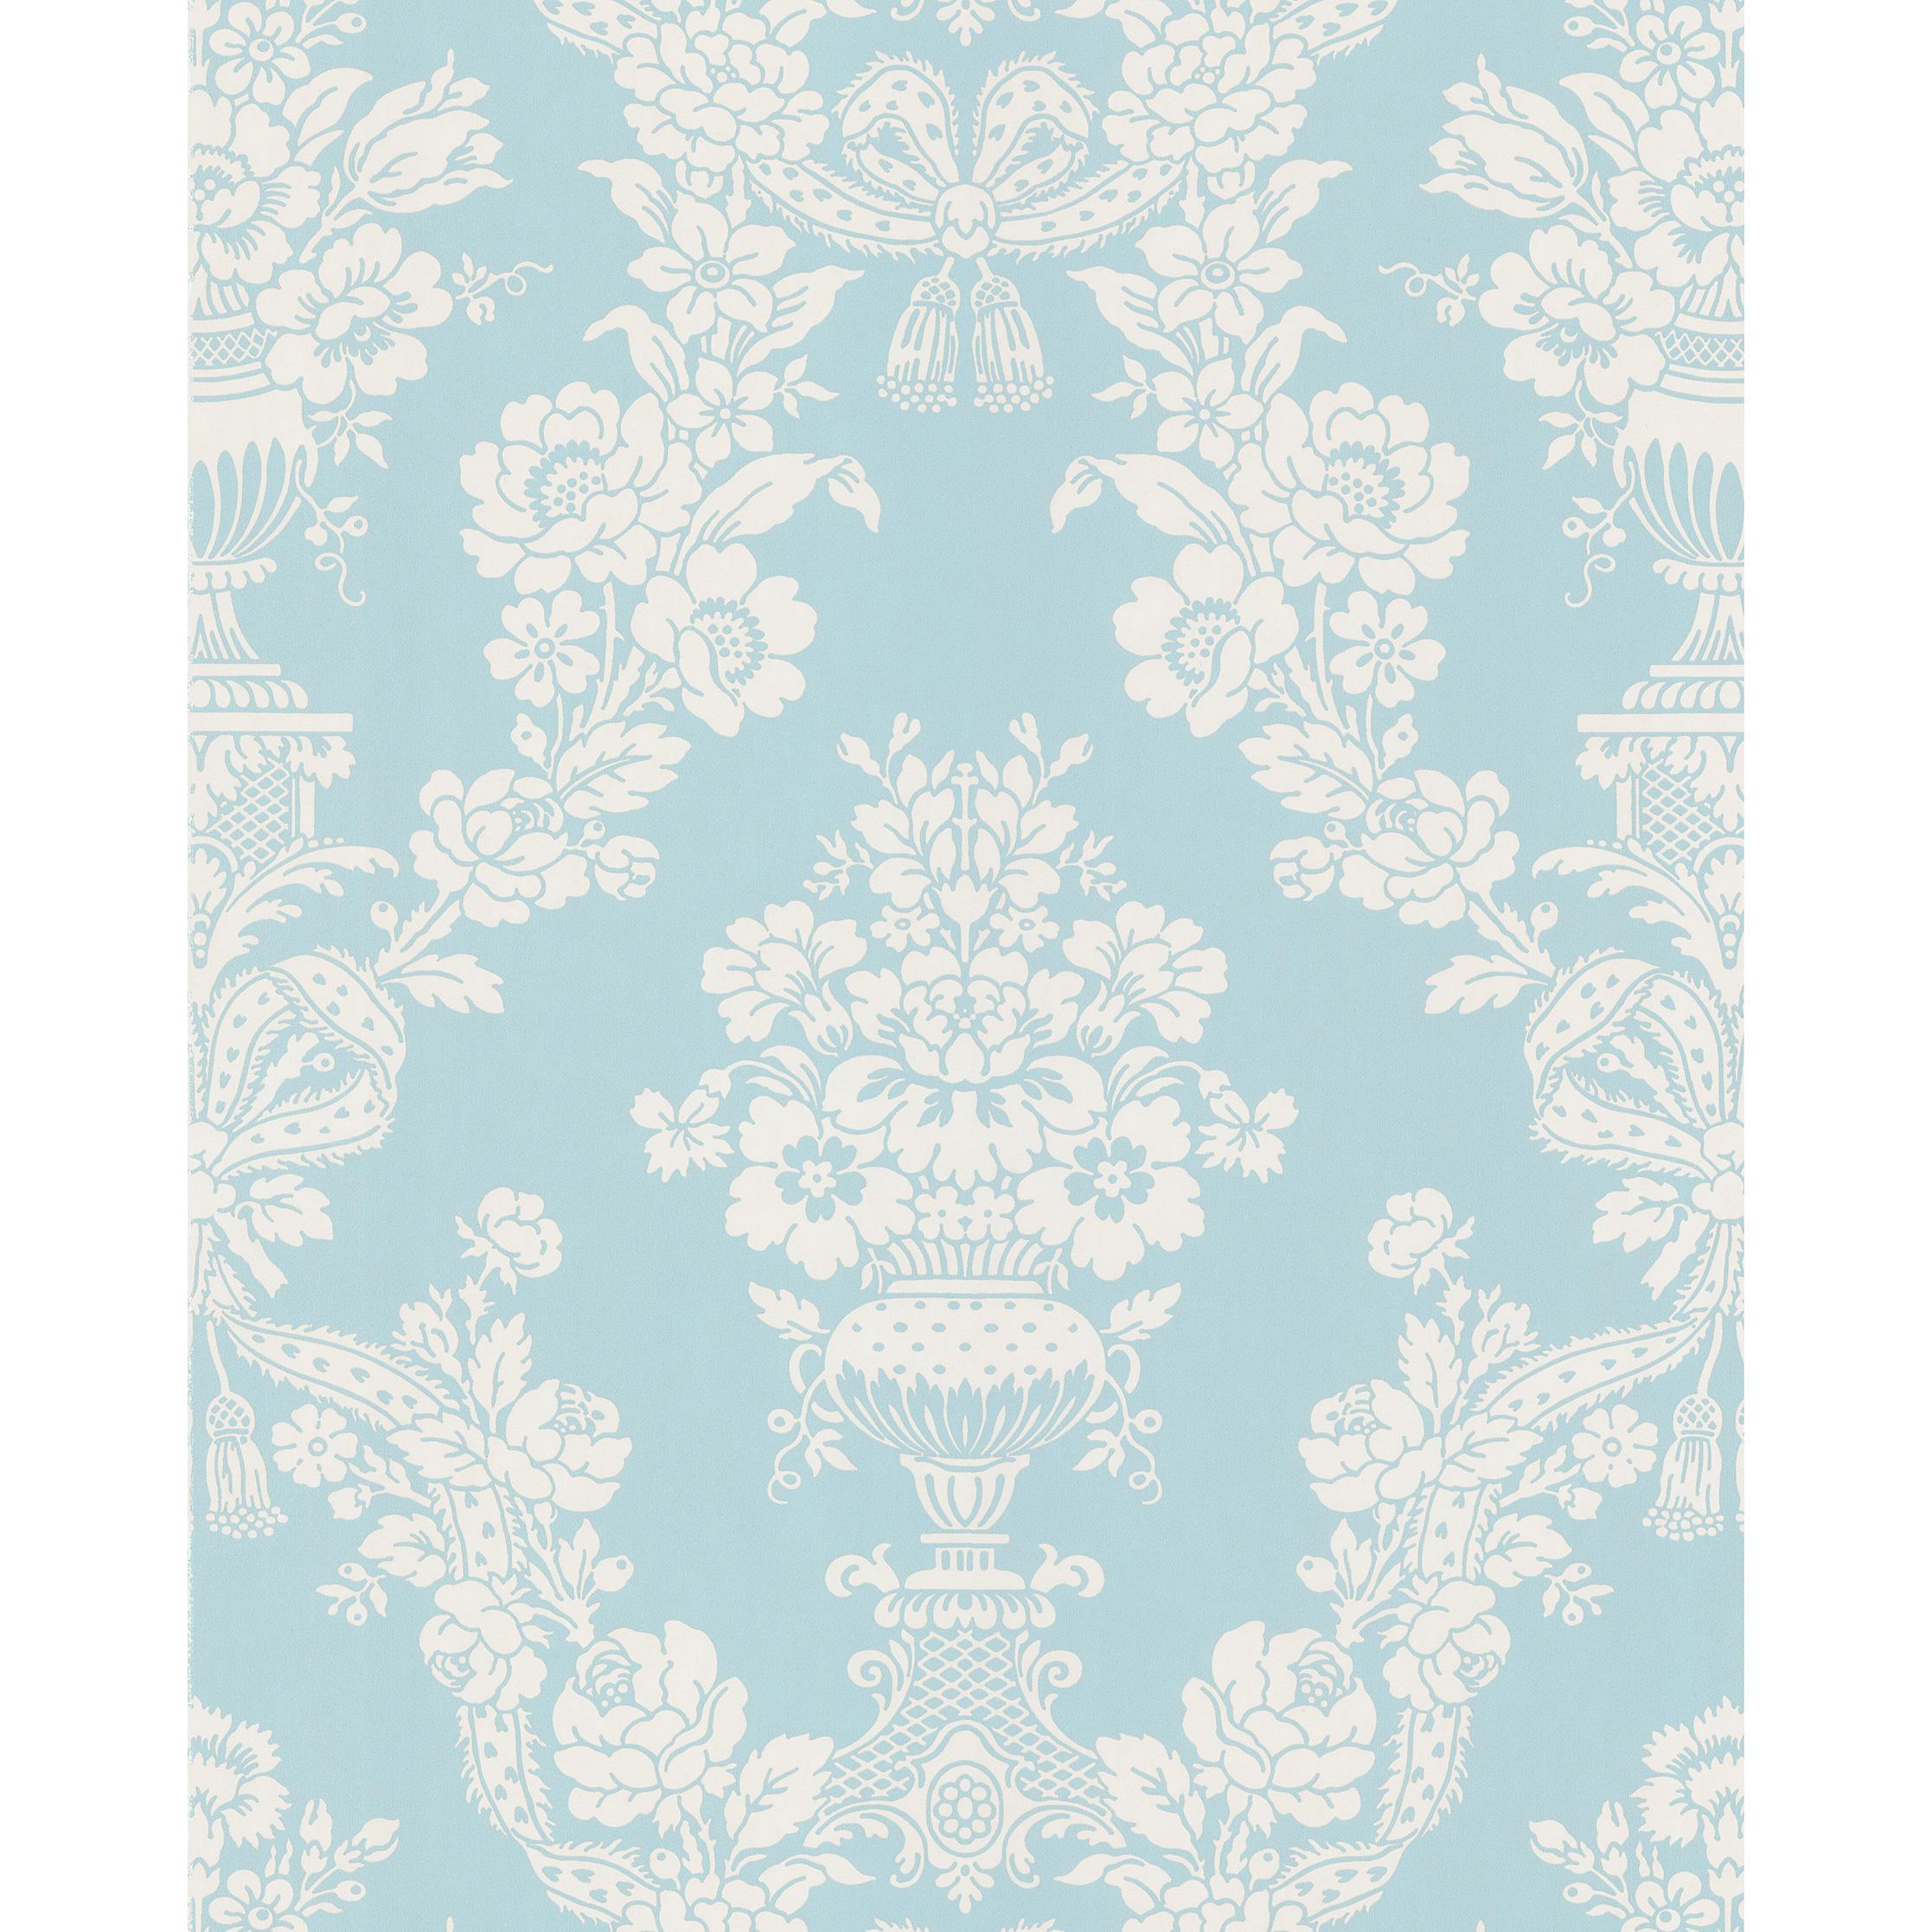 Free Download Light Blue Floral Wallpaper Brewster Aqua Floral